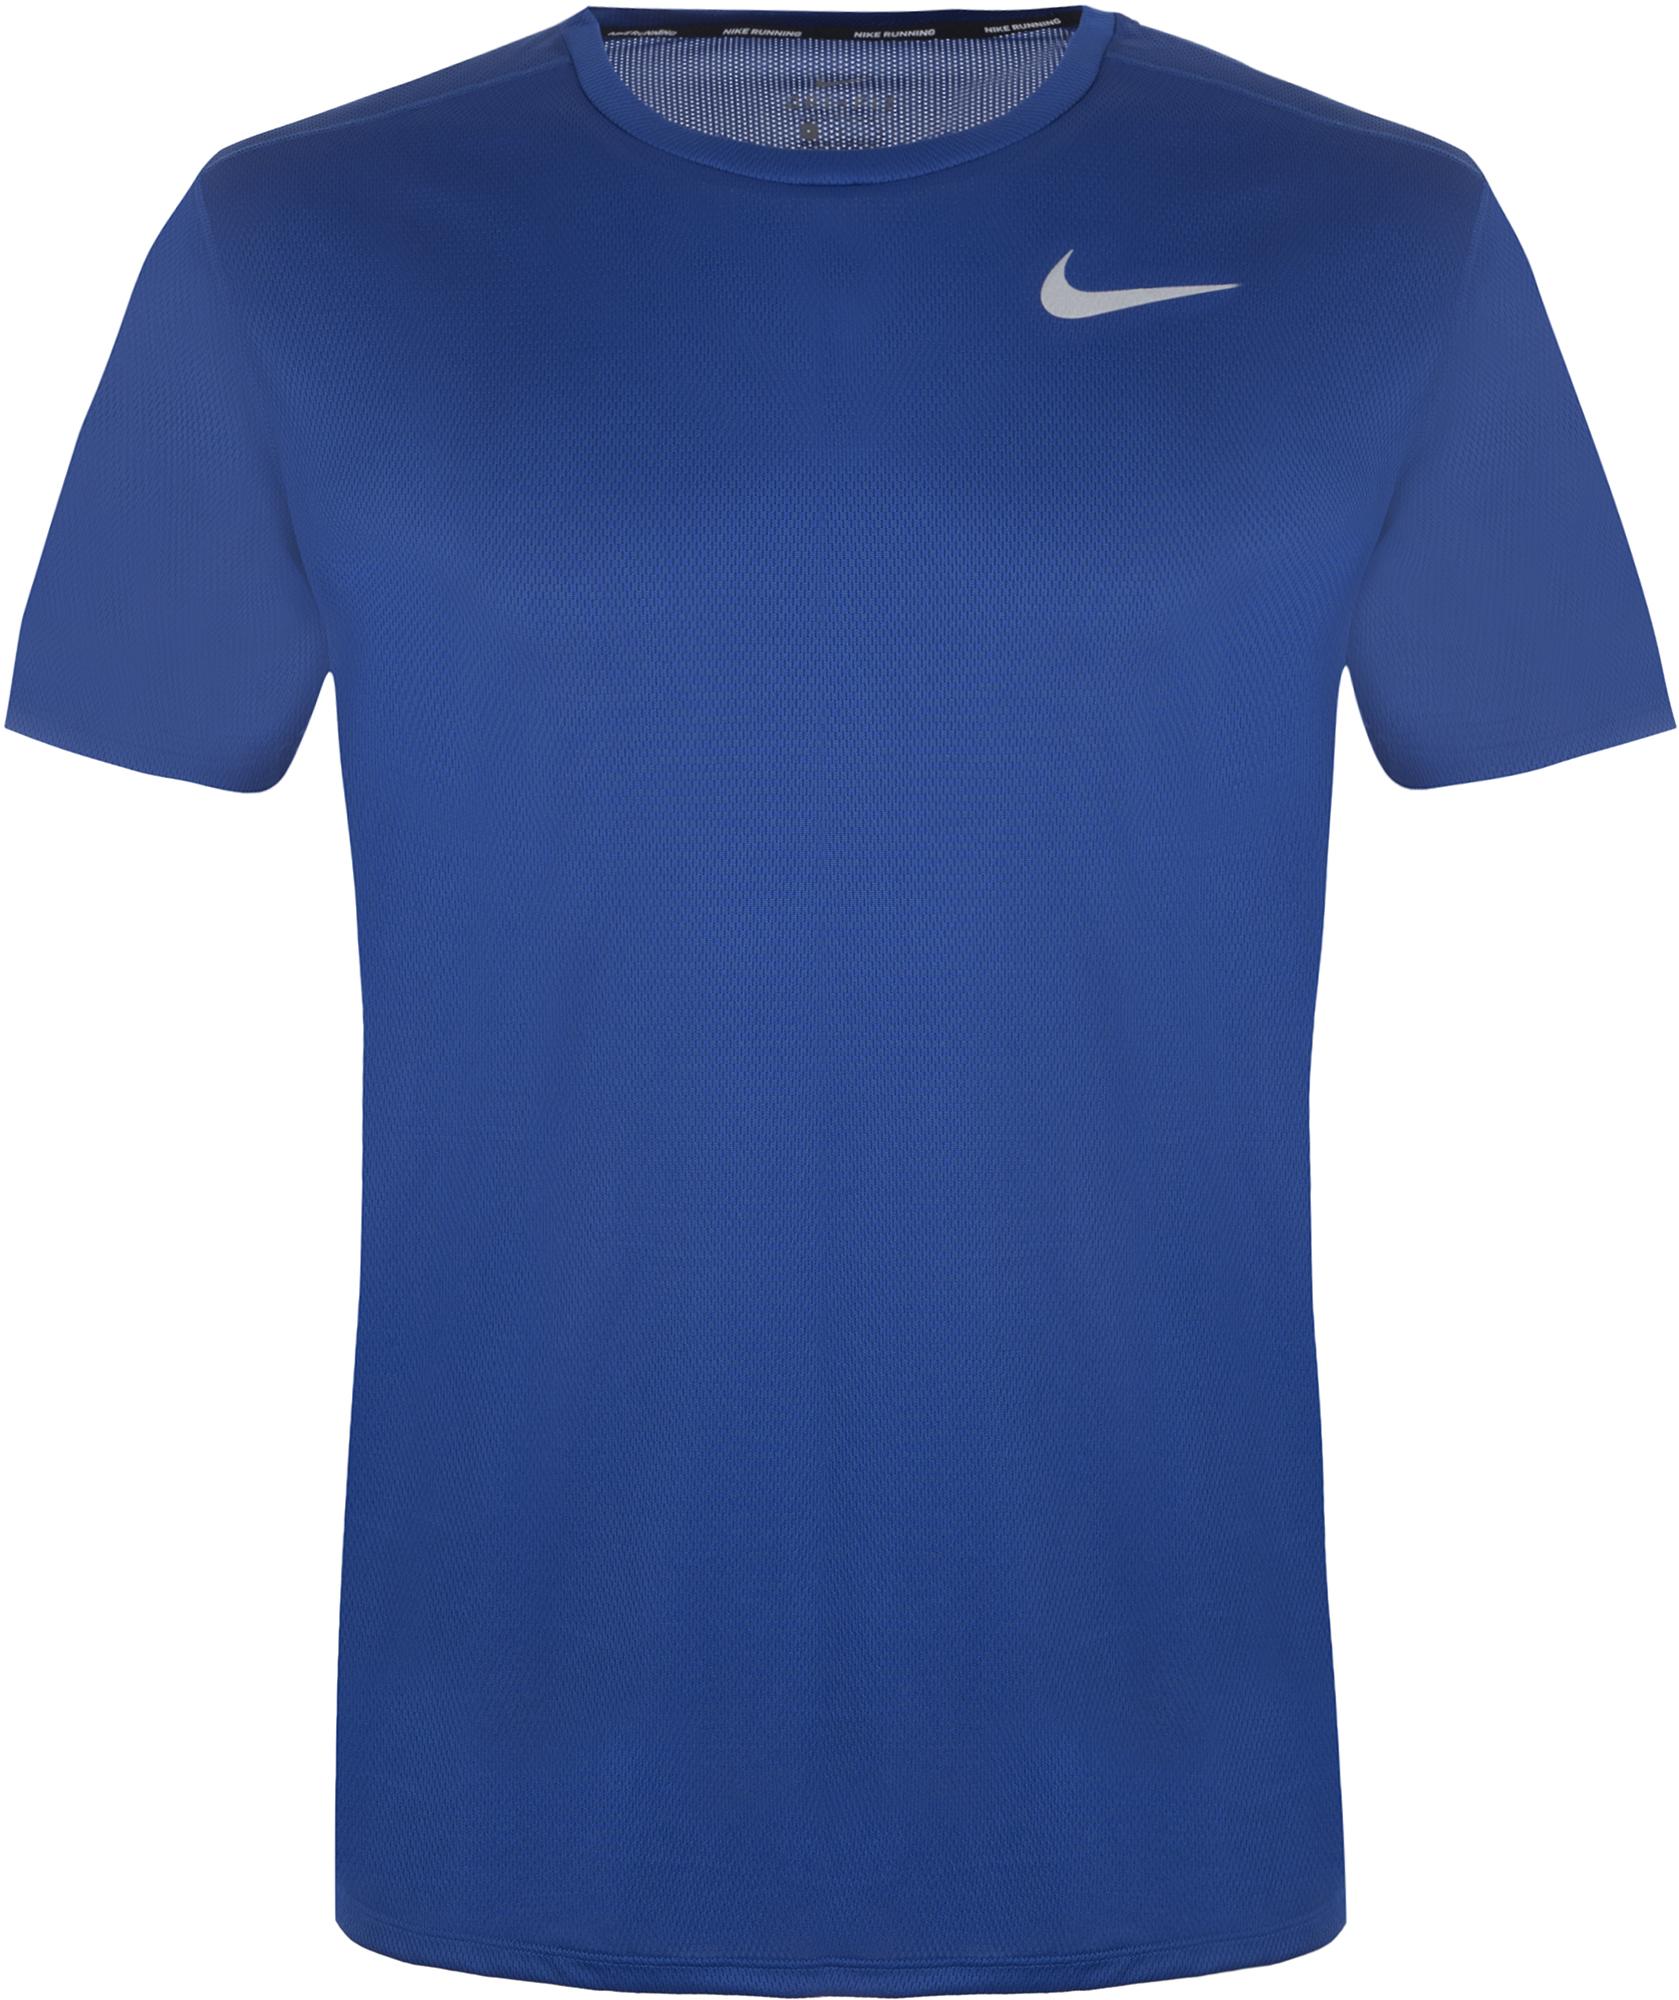 Nike Футболка мужская Nike Breathe Run, размер 50-52